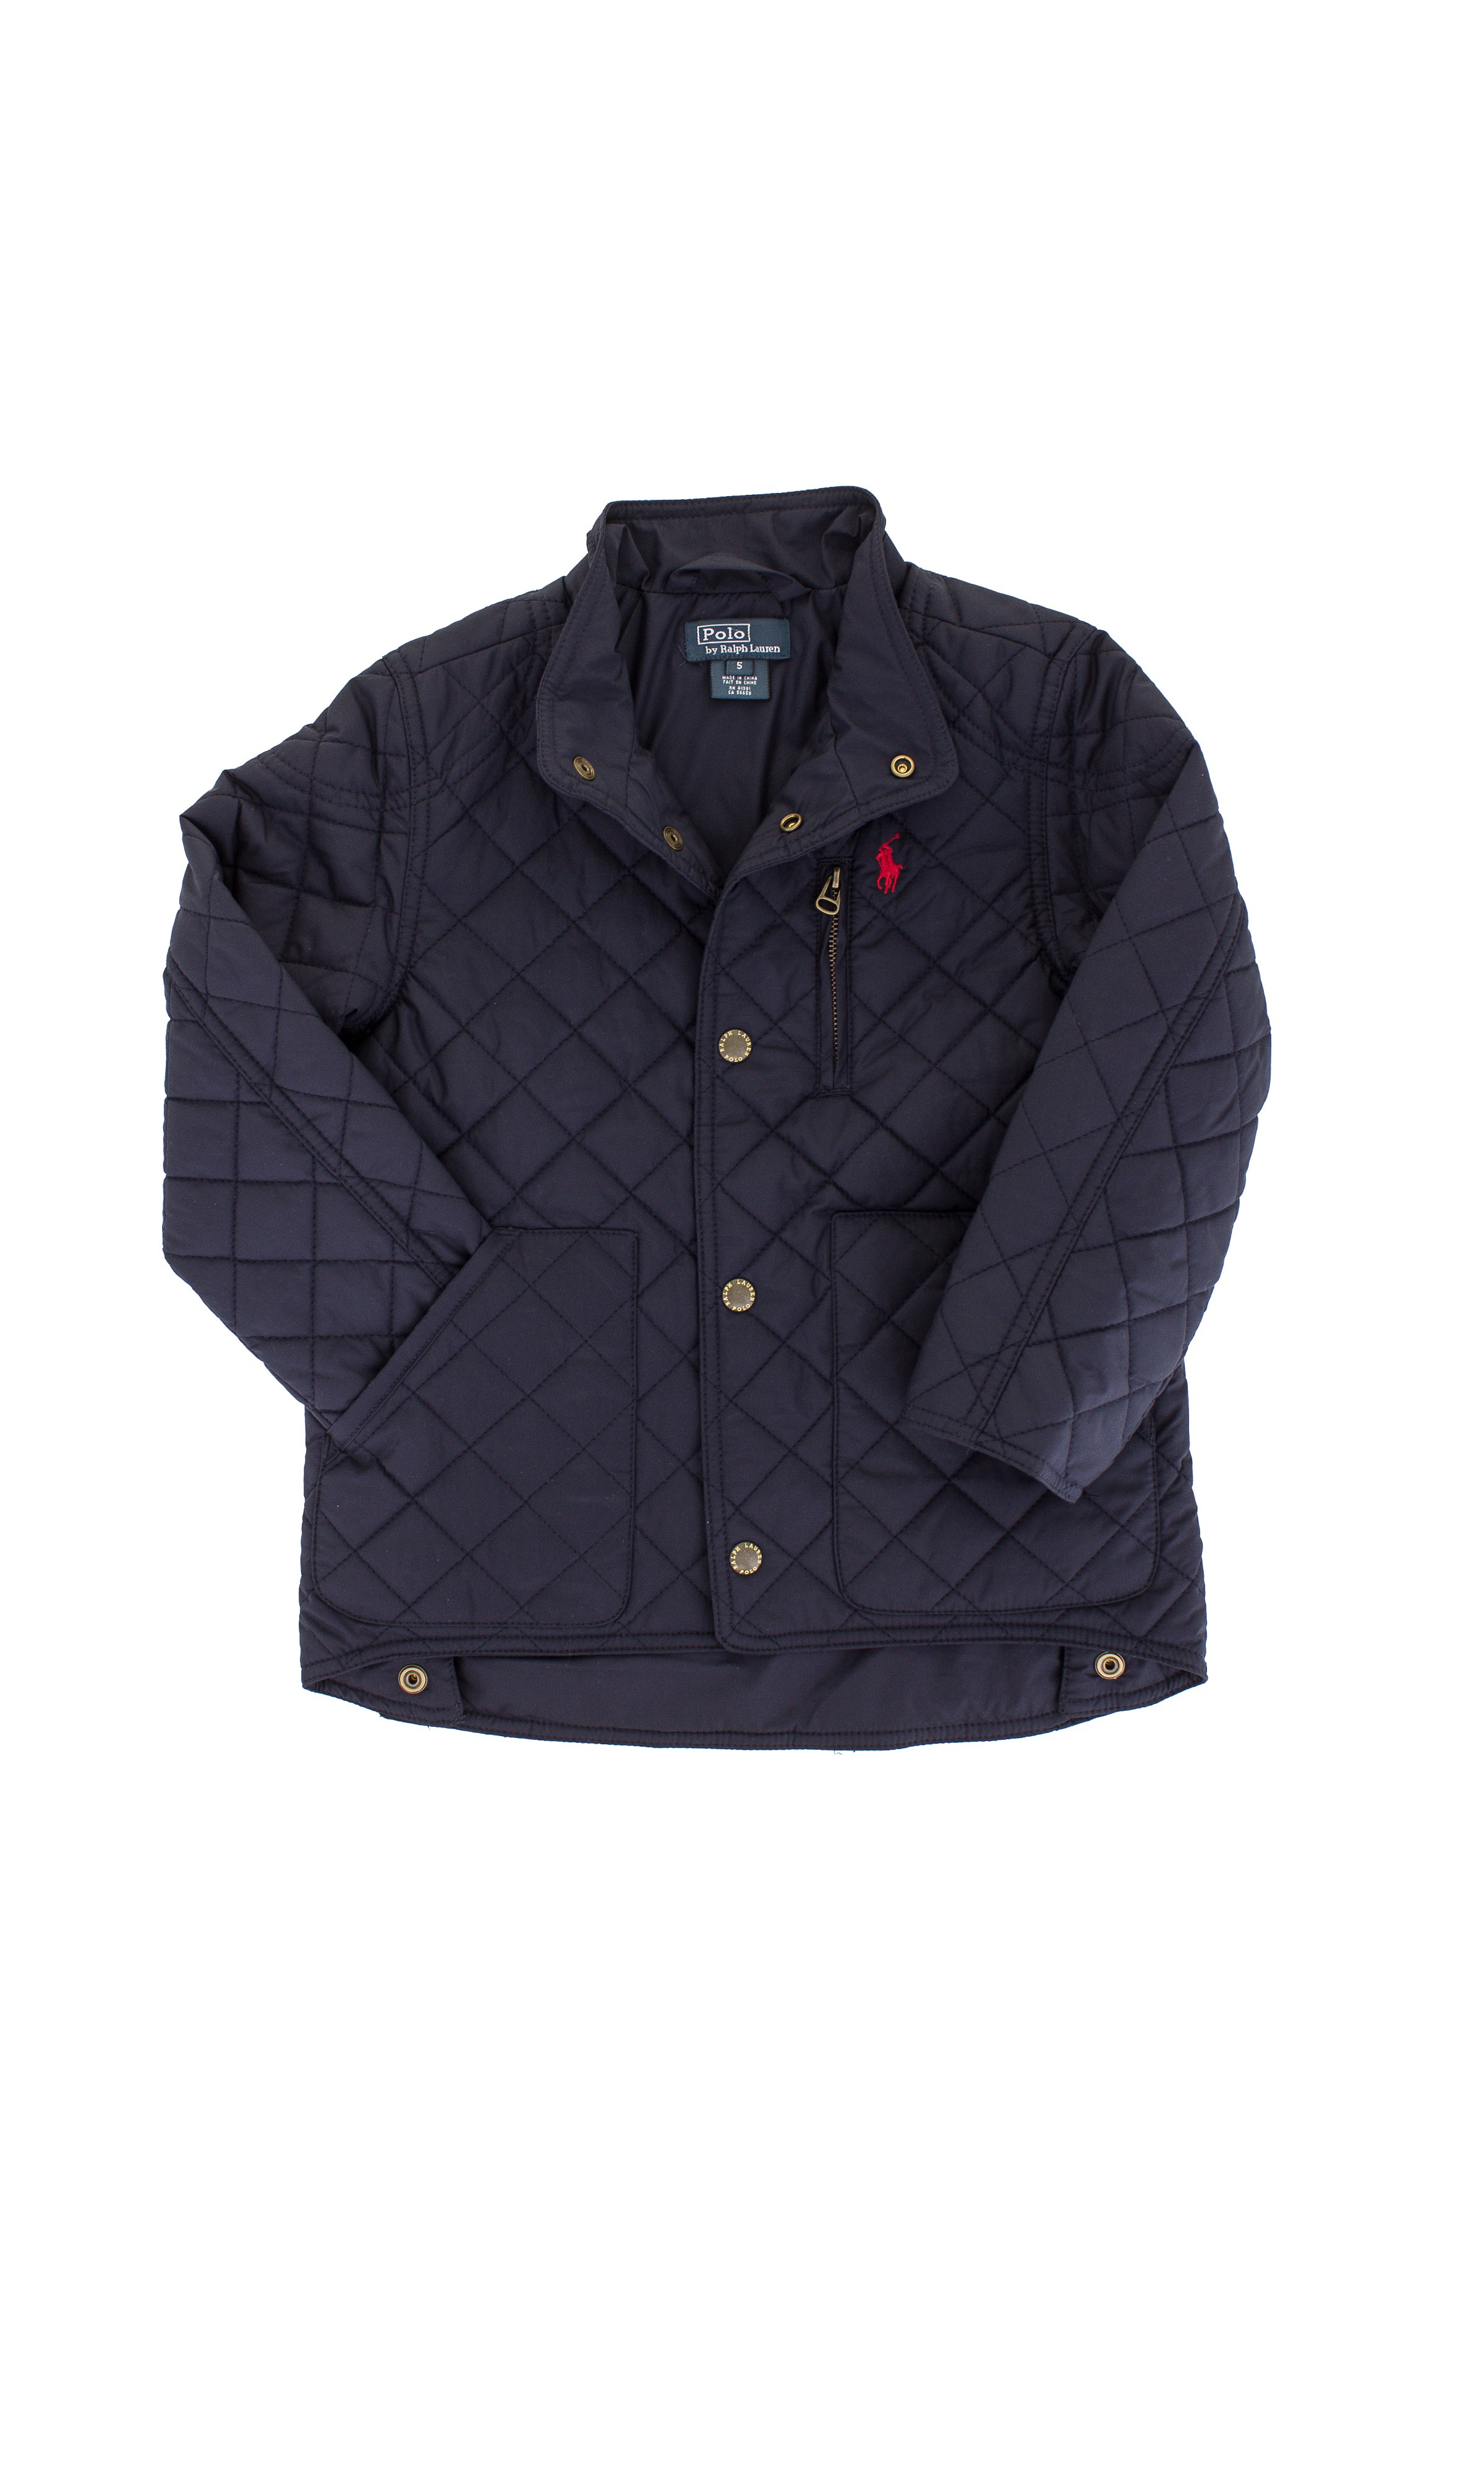 2ed4d39aa6e63 Pikowana granatowa kurtka Polo Ralph Lauren - Celebrity-Club